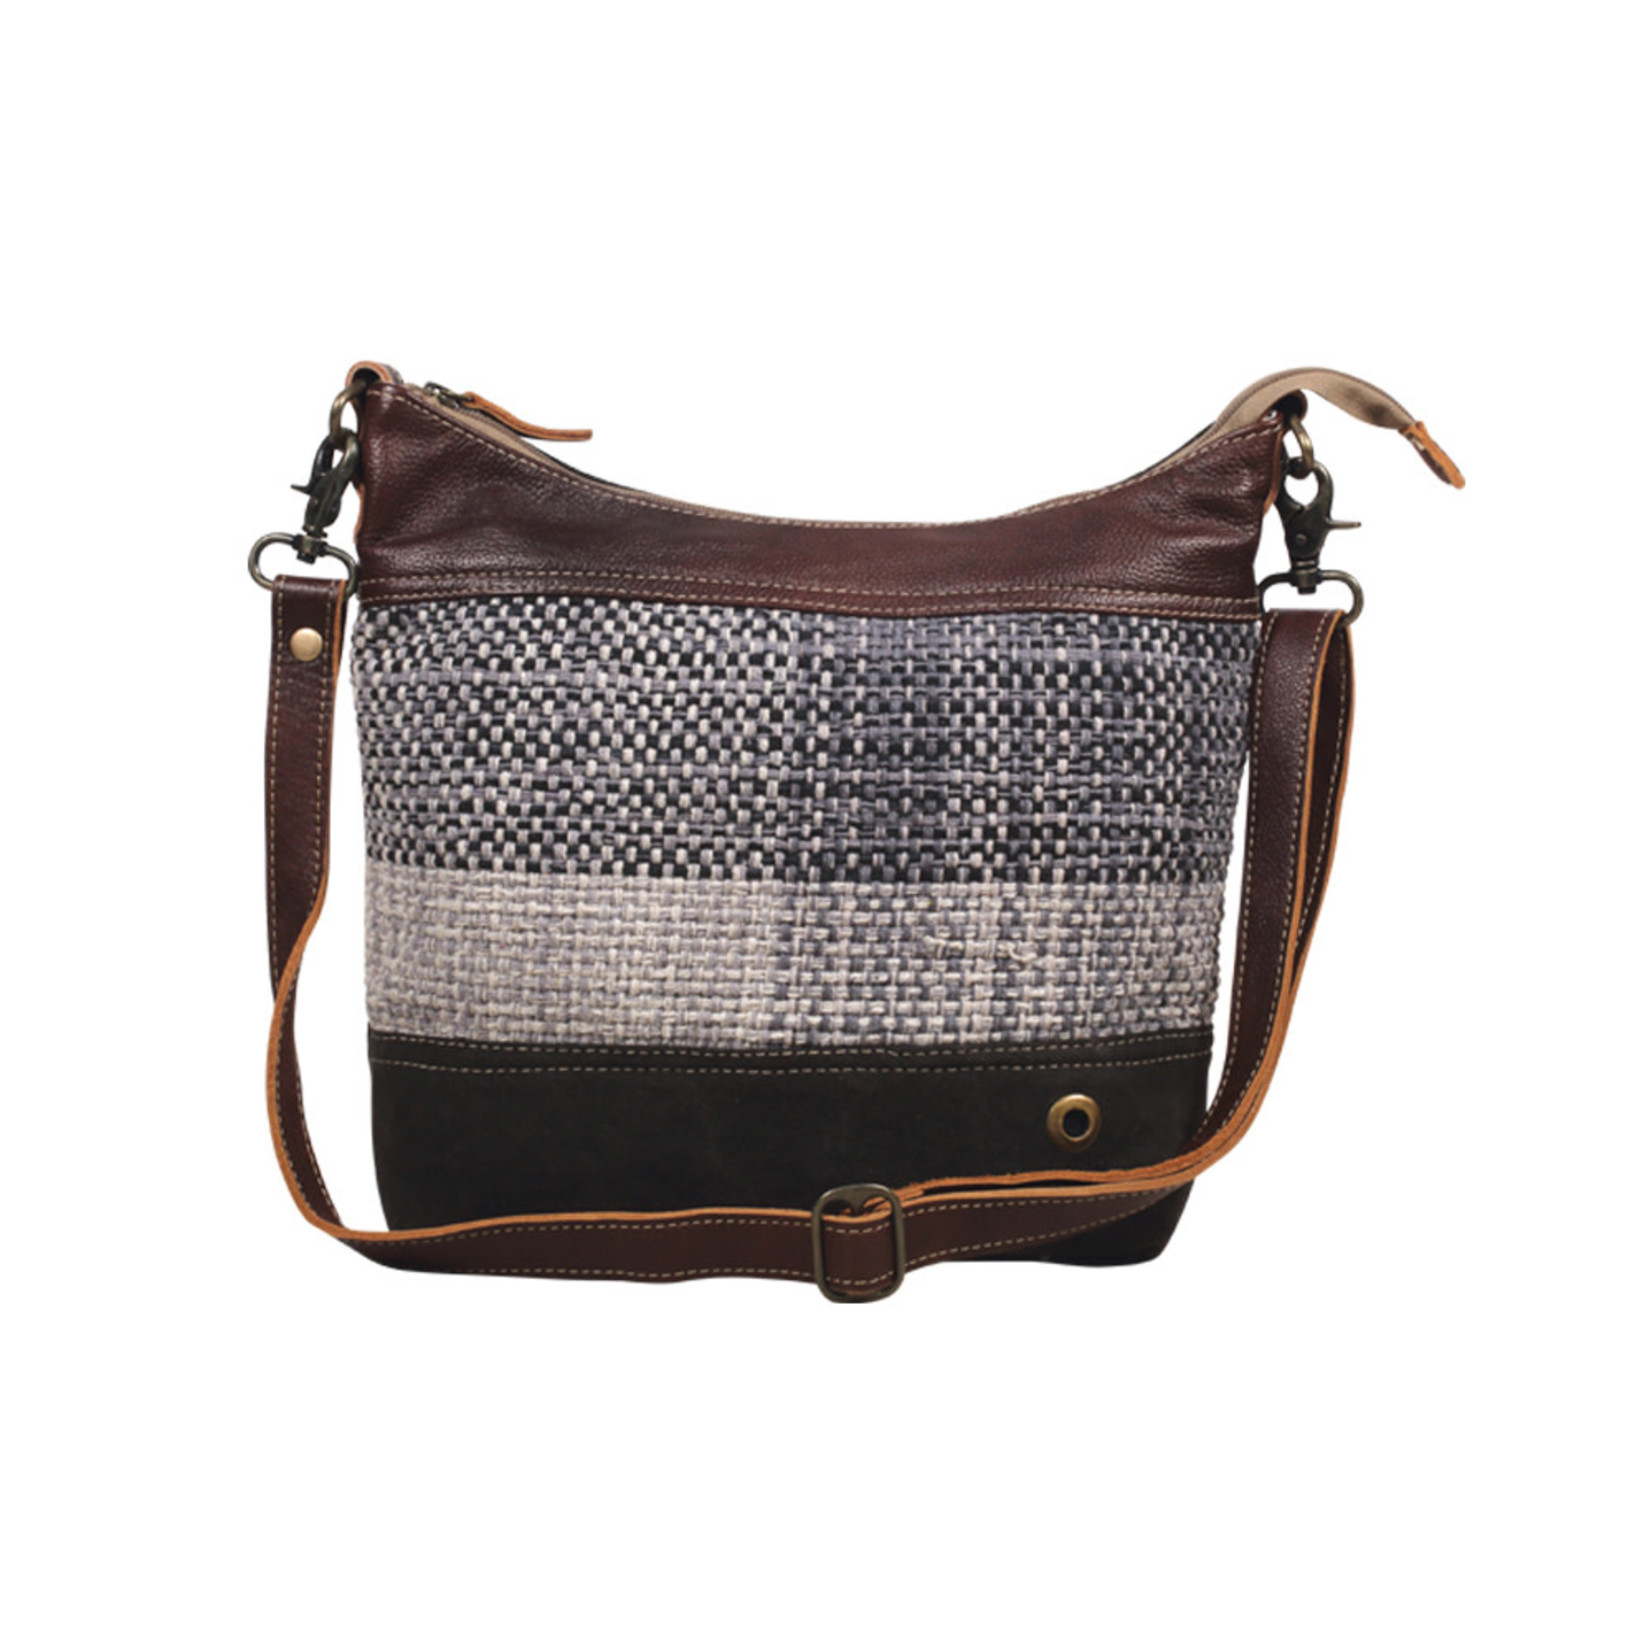 Myra Bags S-2057 Seemliness Shoulder Bag